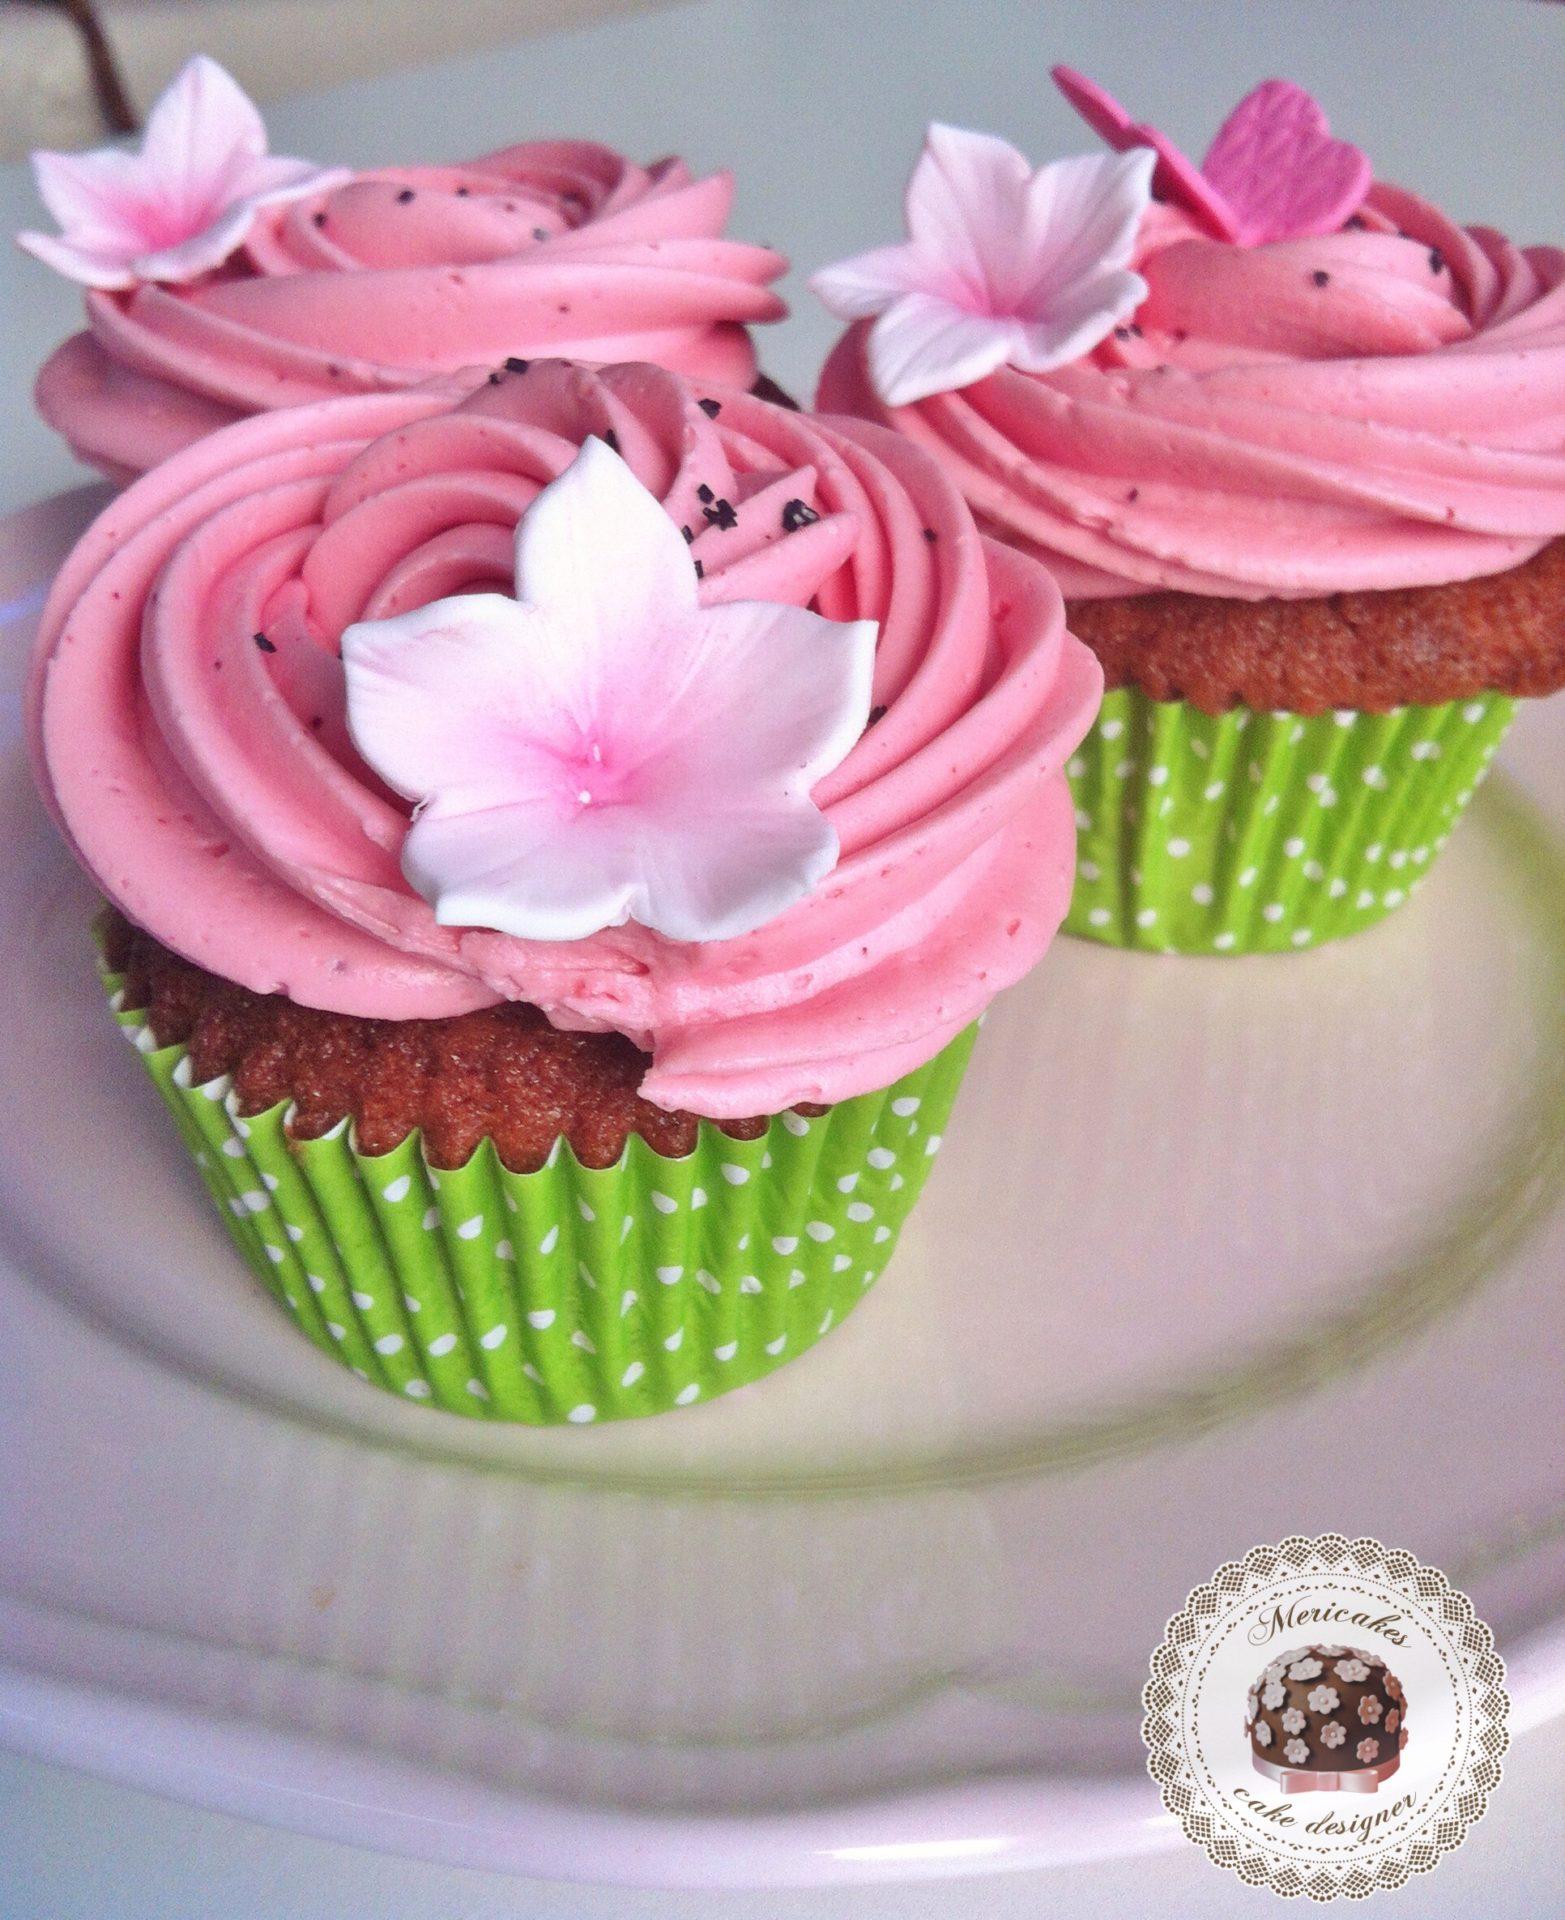 watermelon-cupcakes-sandia-receta-chocolate-mericakes-barcelona-reposteria-3